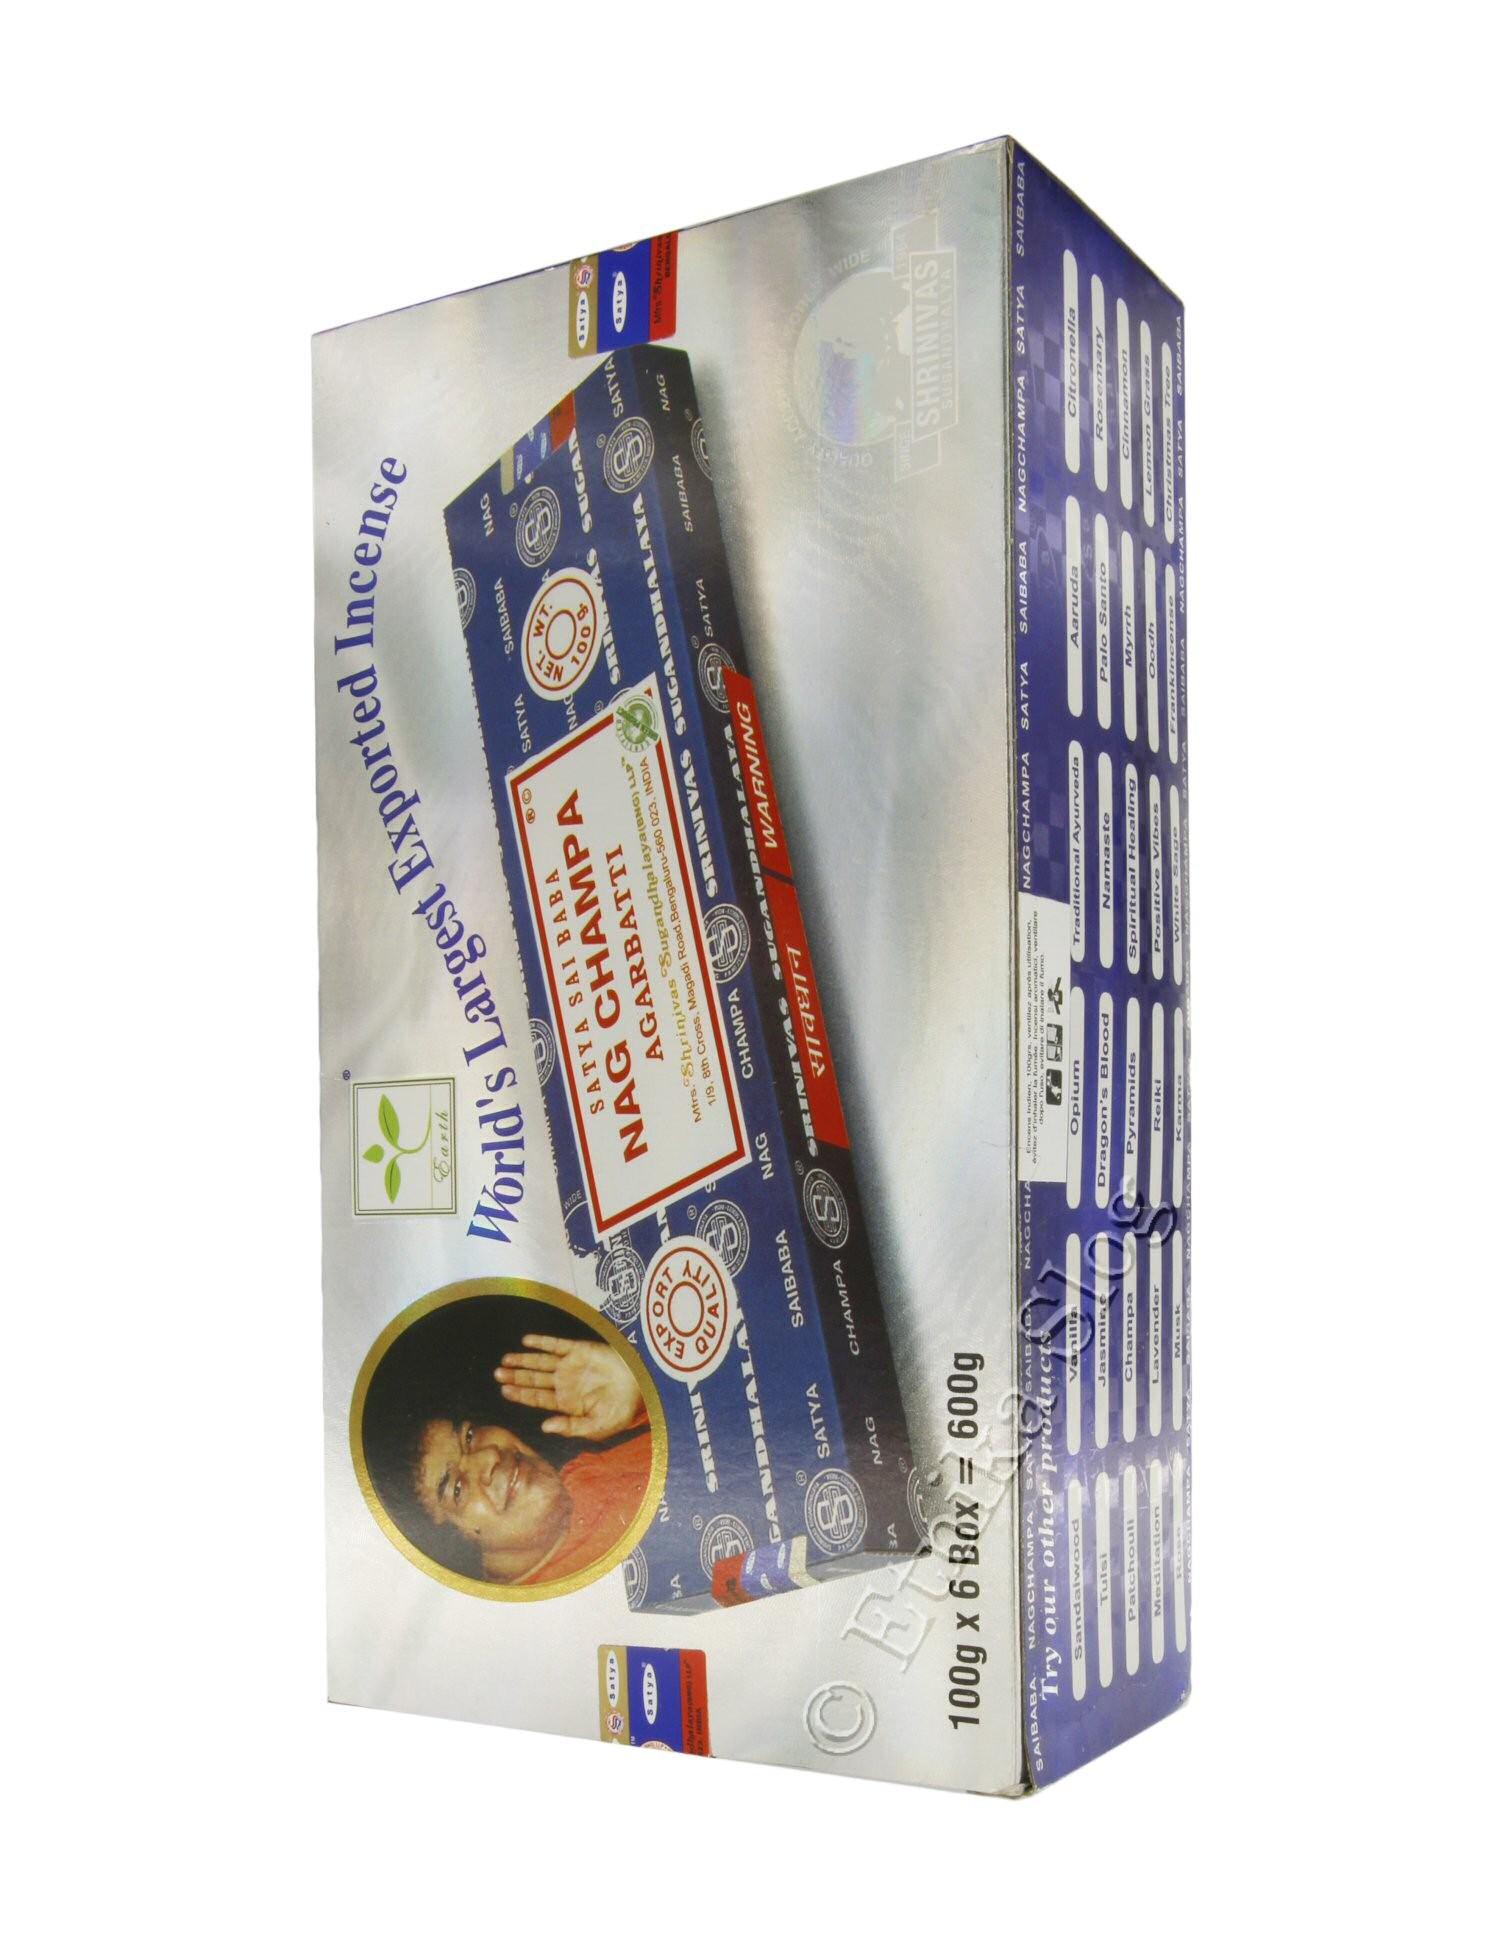 INCENSI BASTONCINO INDIANI NATURALI INC-NC02 - Oriente Import S.r.l.